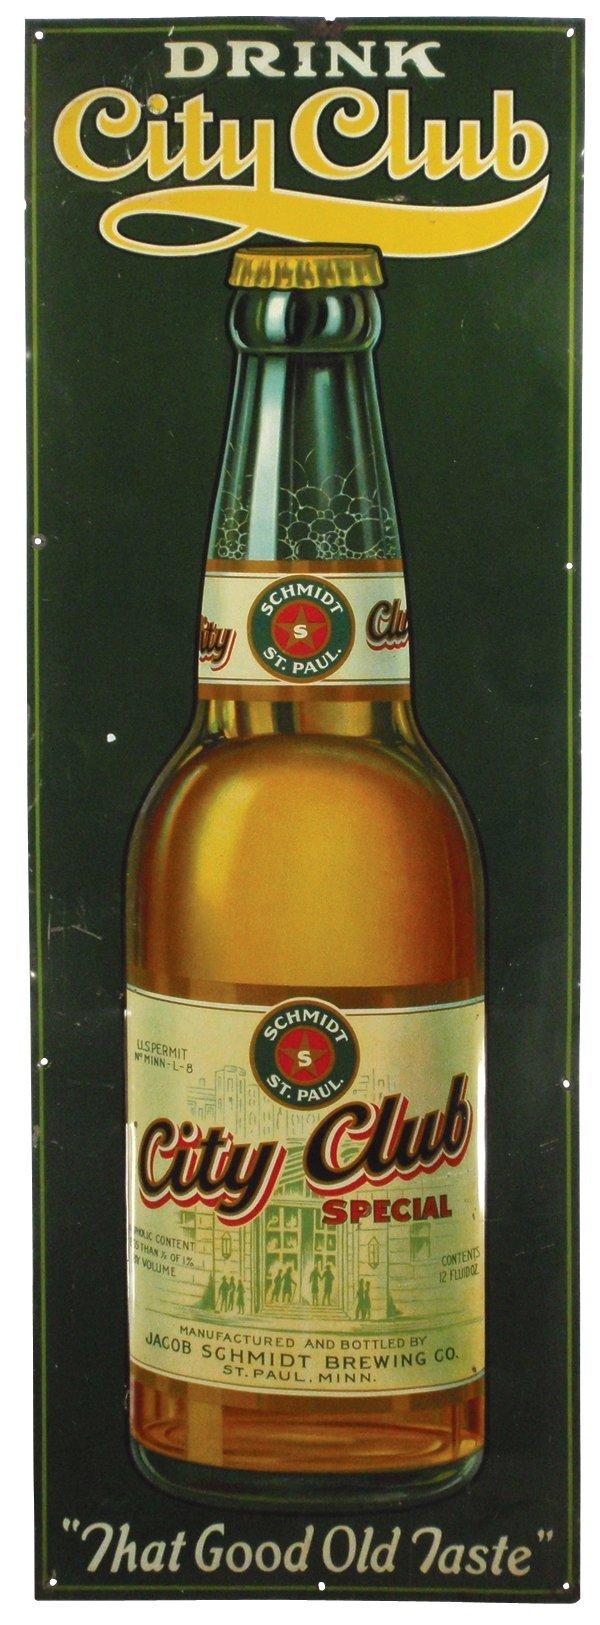 0021: Drink City Club Beer metal sign w/bottle graphics